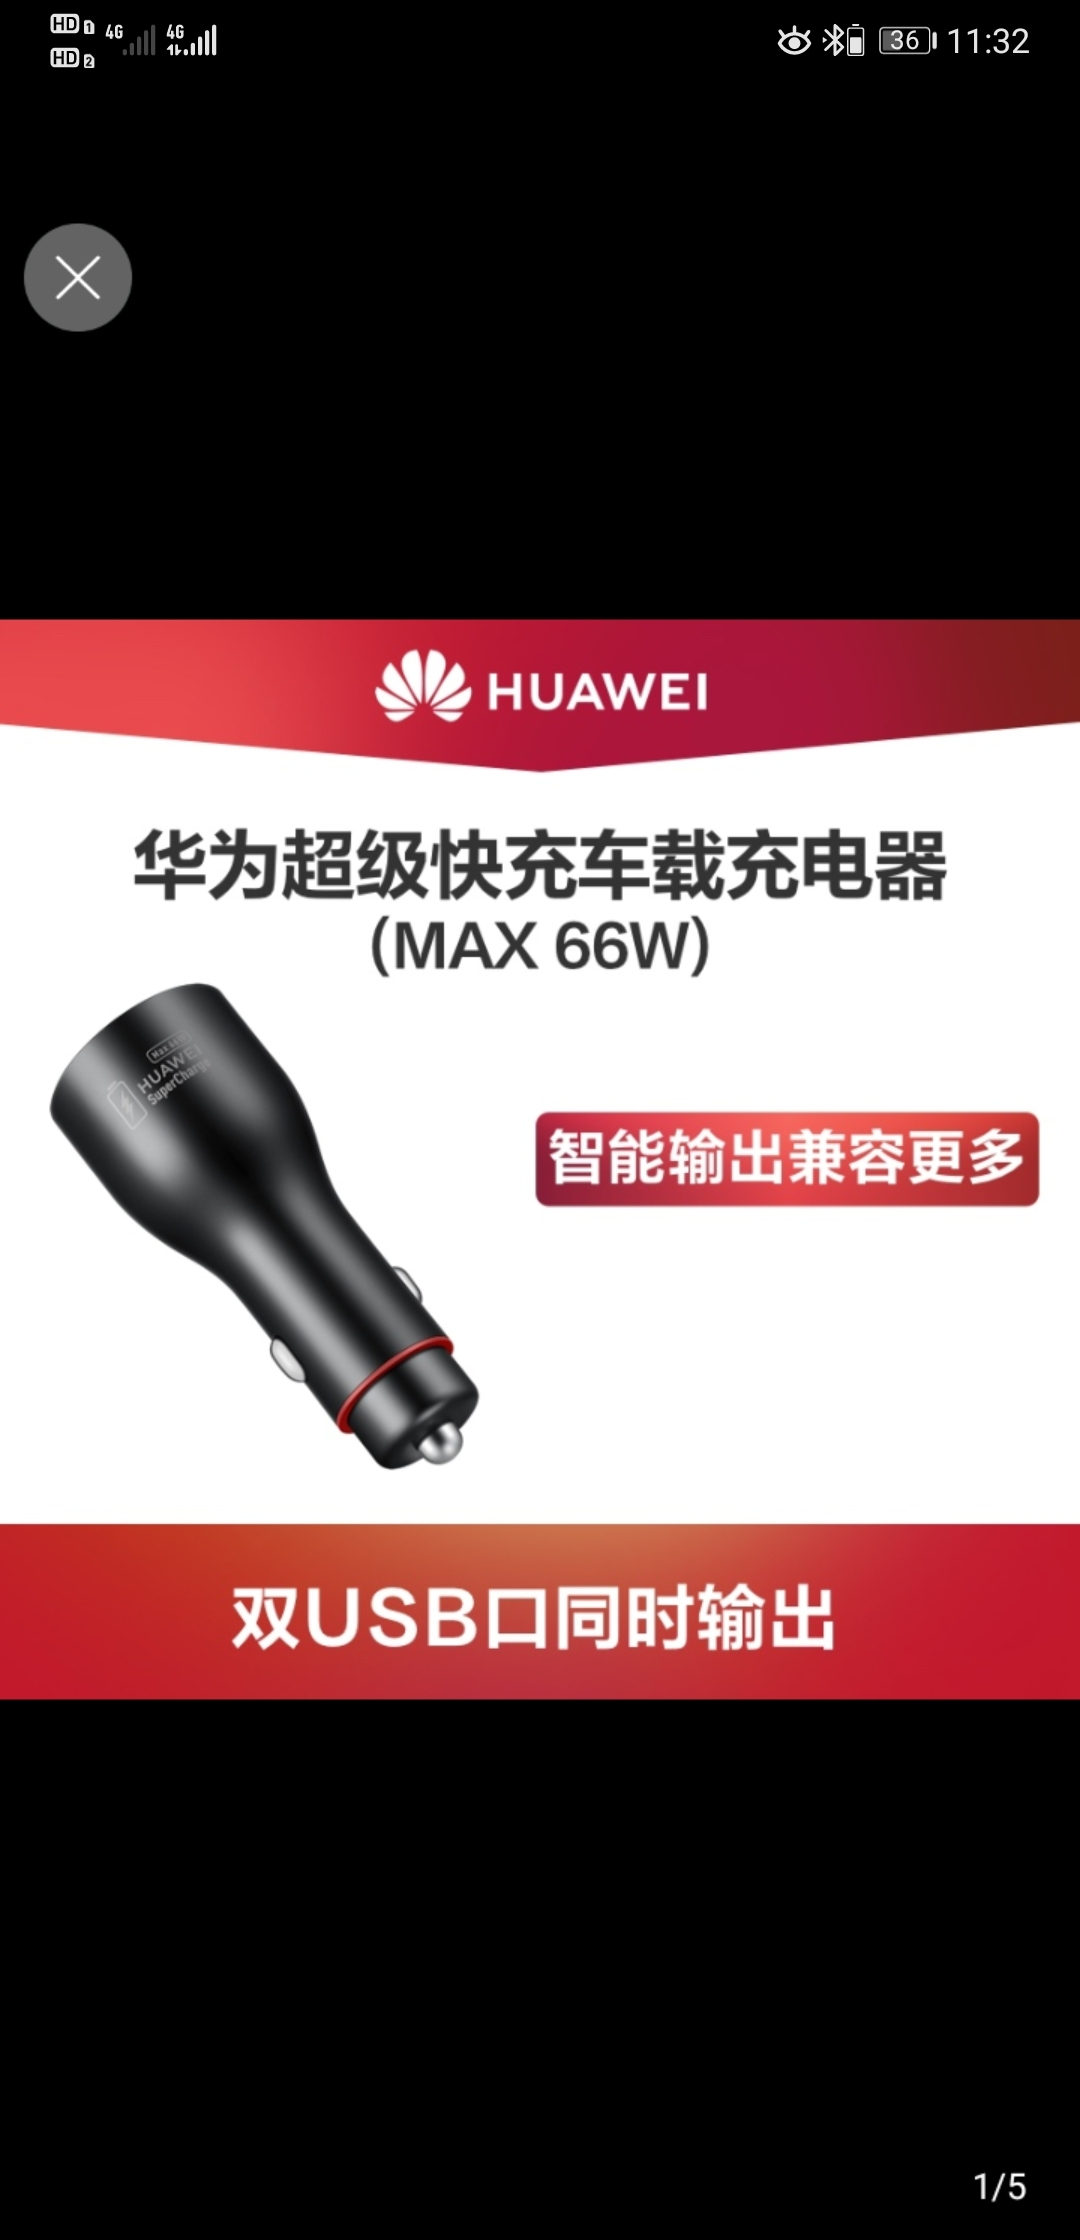 Screenshot_20210315_113202_com.taobao.taobao.jpg